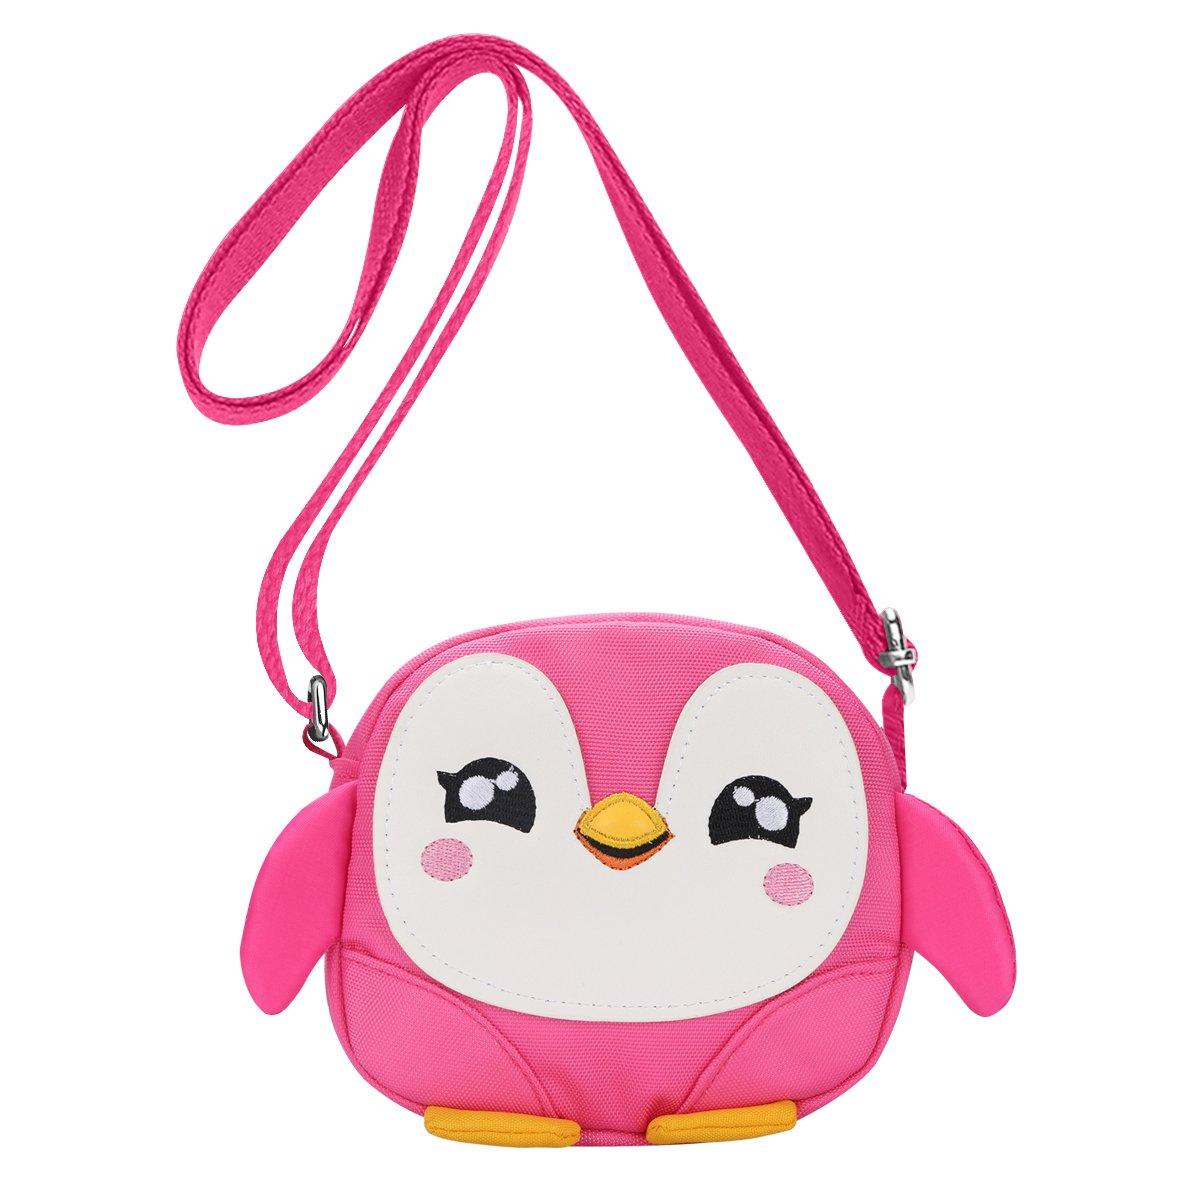 DEEKEY Little Girls Purses for Kids - Toddler Mini Cute Princess Handbags Shoulder Messenger Bag Toys Gifts Crossbody Purse by DEEKEY